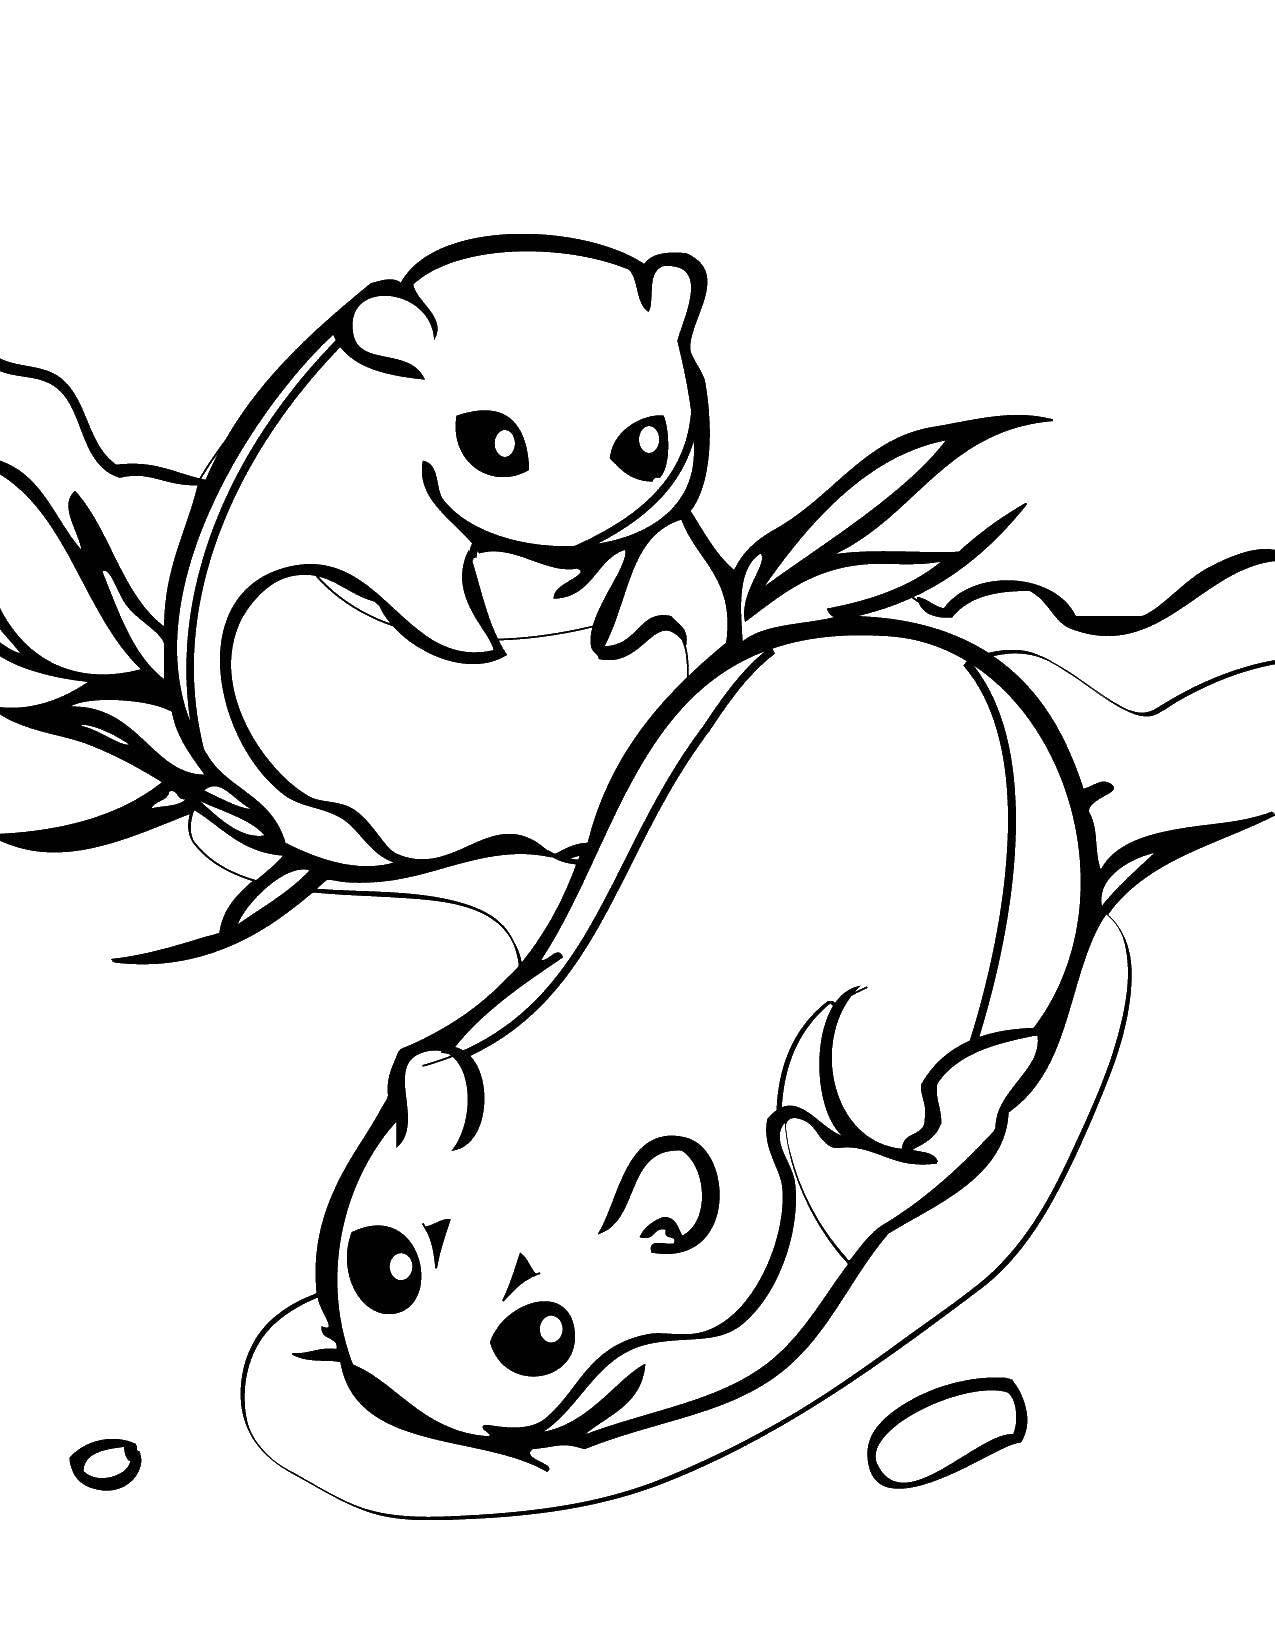 Раскраска  Скачать кунг фу панда, Мастер Обезьяна.  Распечатать ,кунг фу панда,